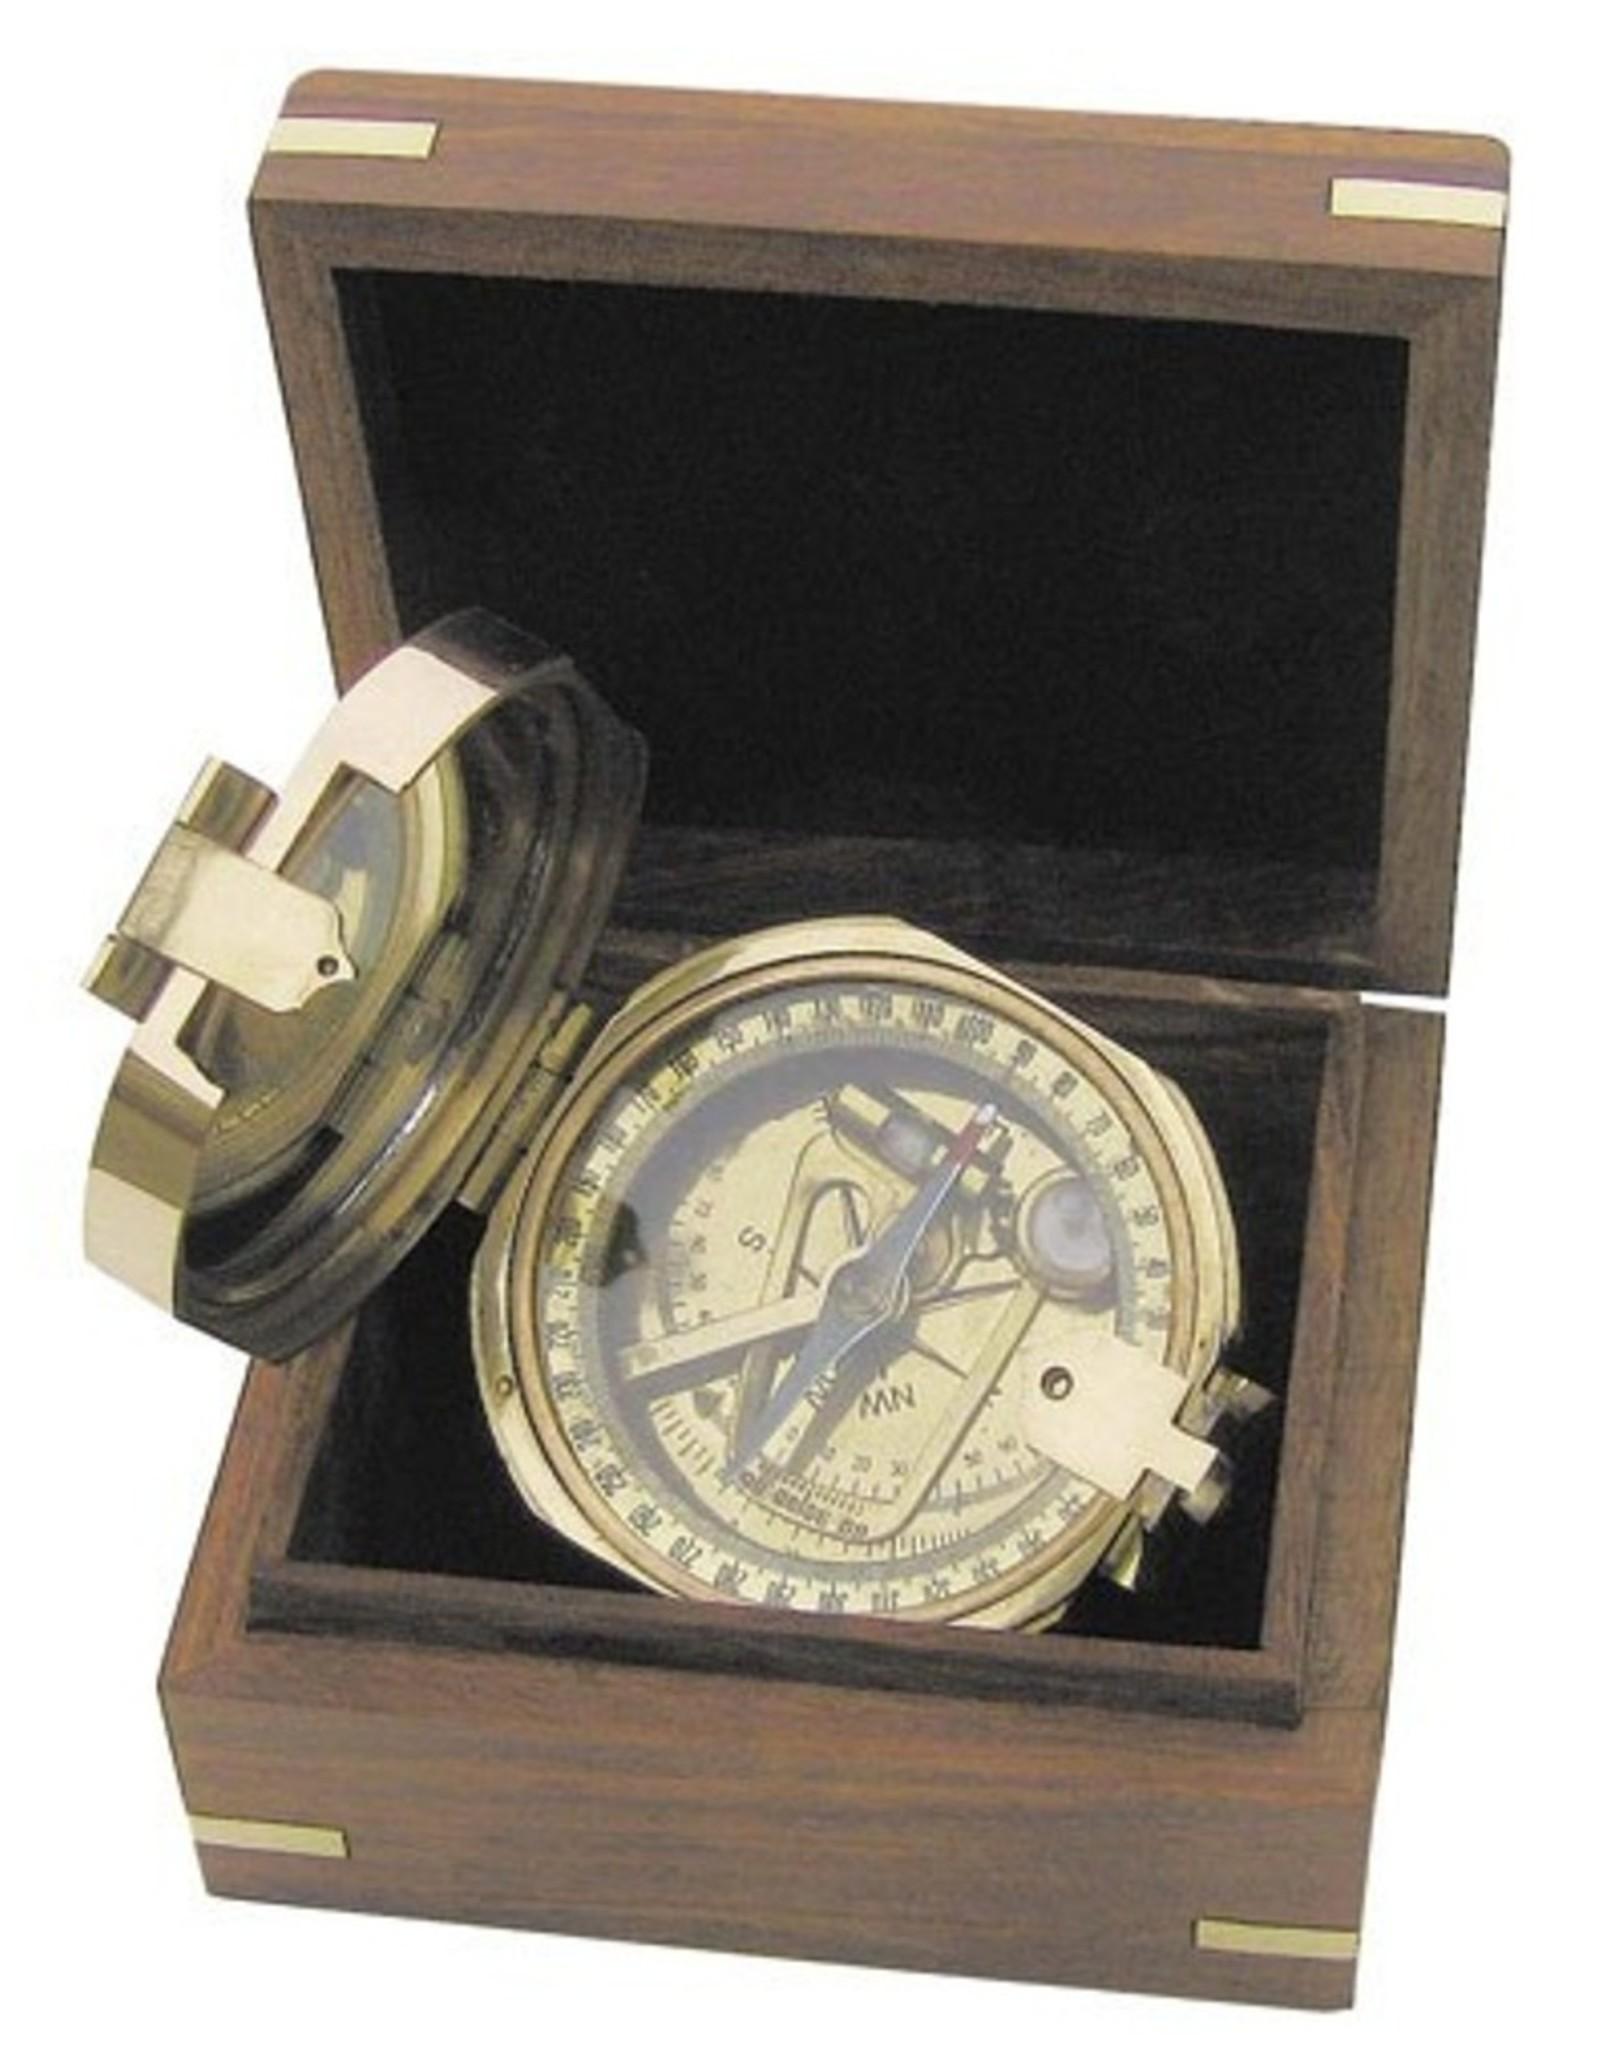 Trukado Giftware en Collectables -  Brunton Kompas met peilspiegel (messing)